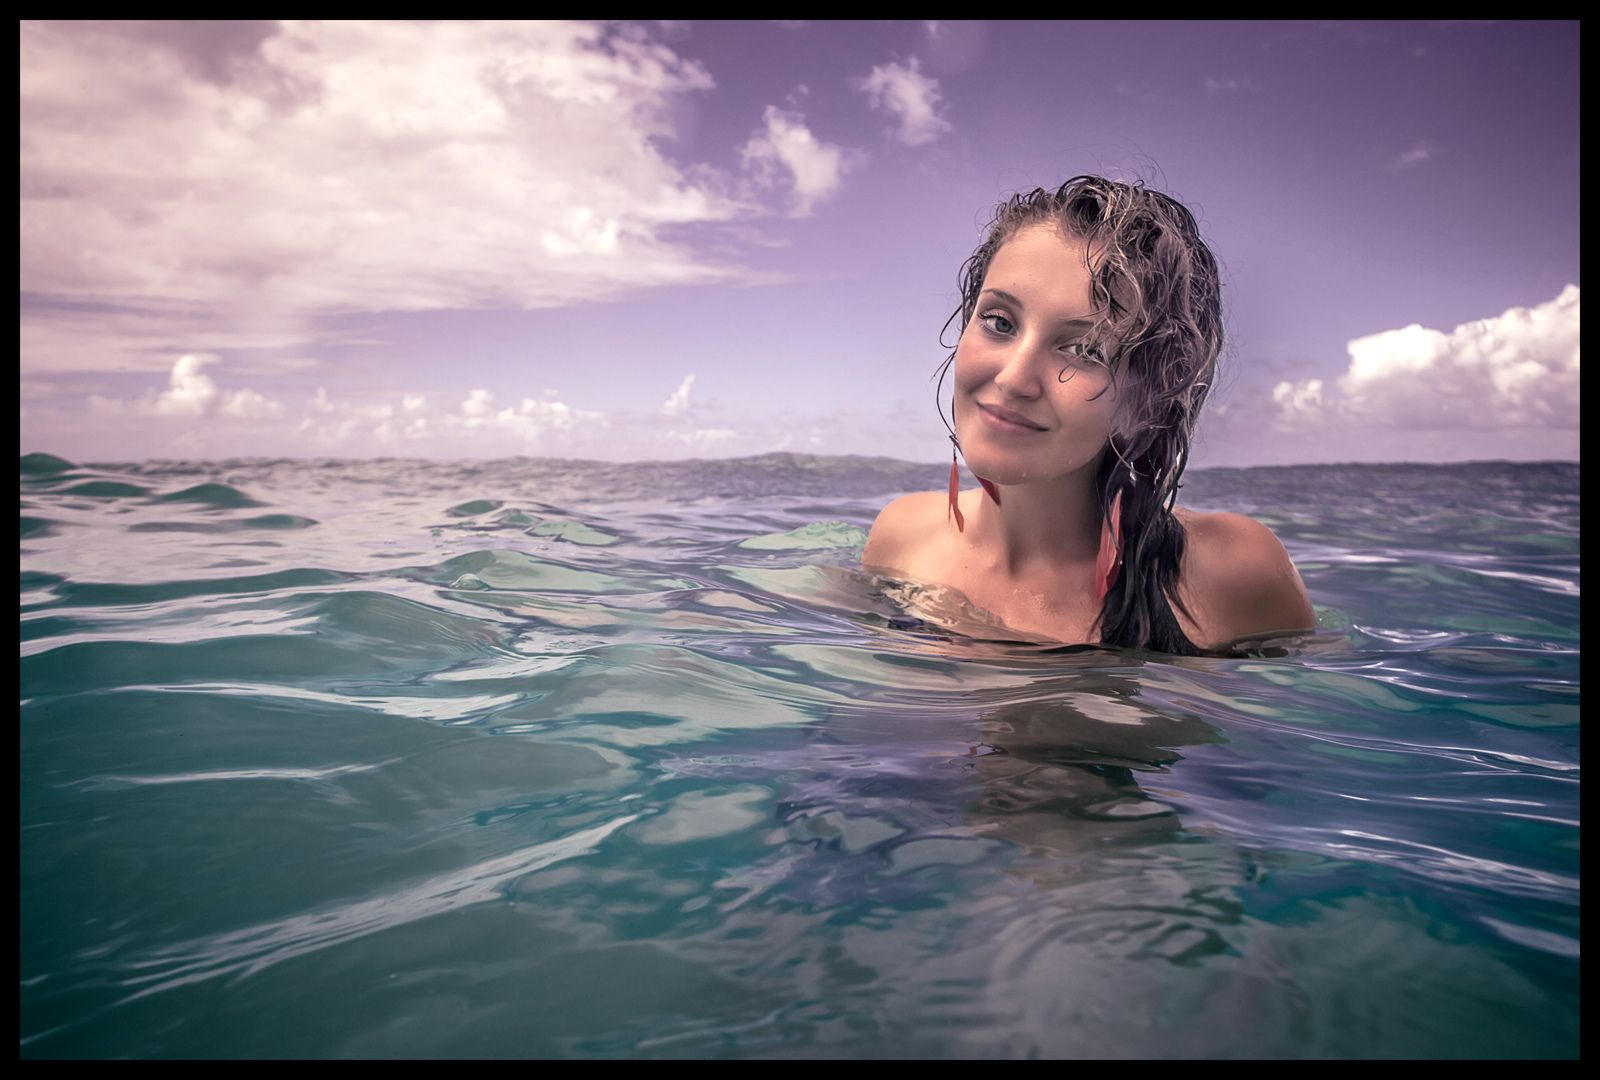 Ellen.  New Zealand polo player and beach girl